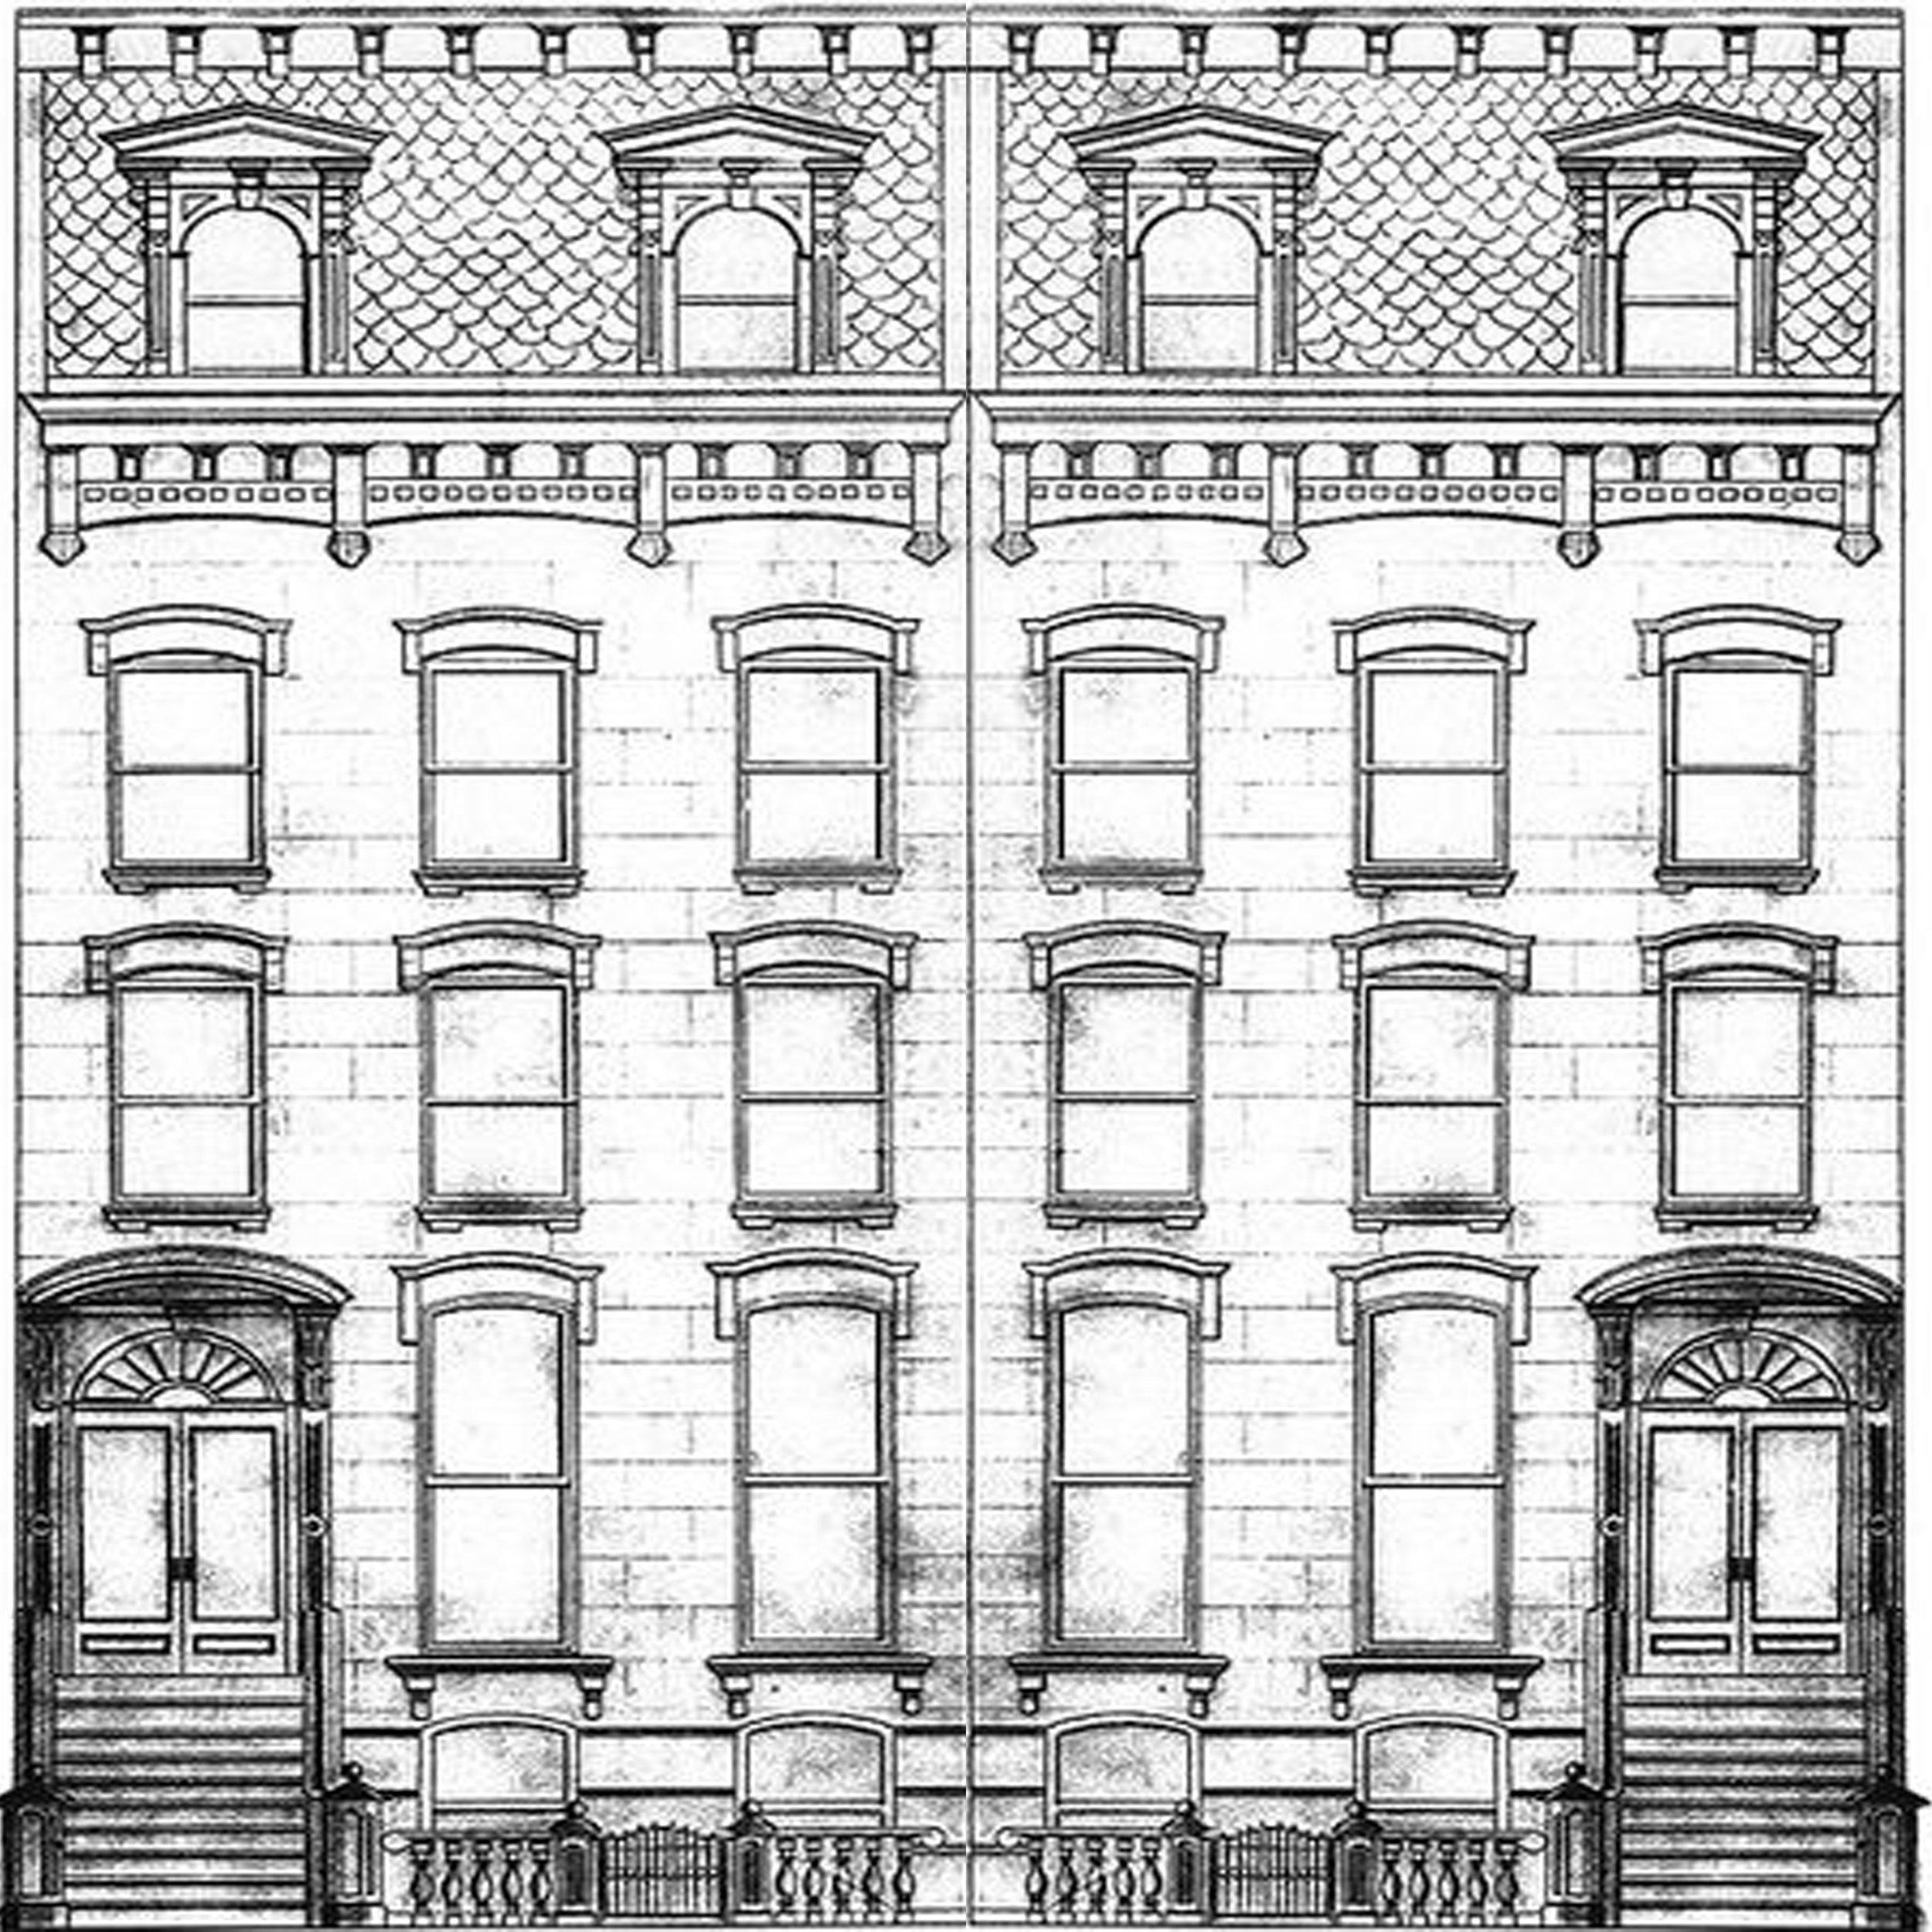 Copy of Gates Ave